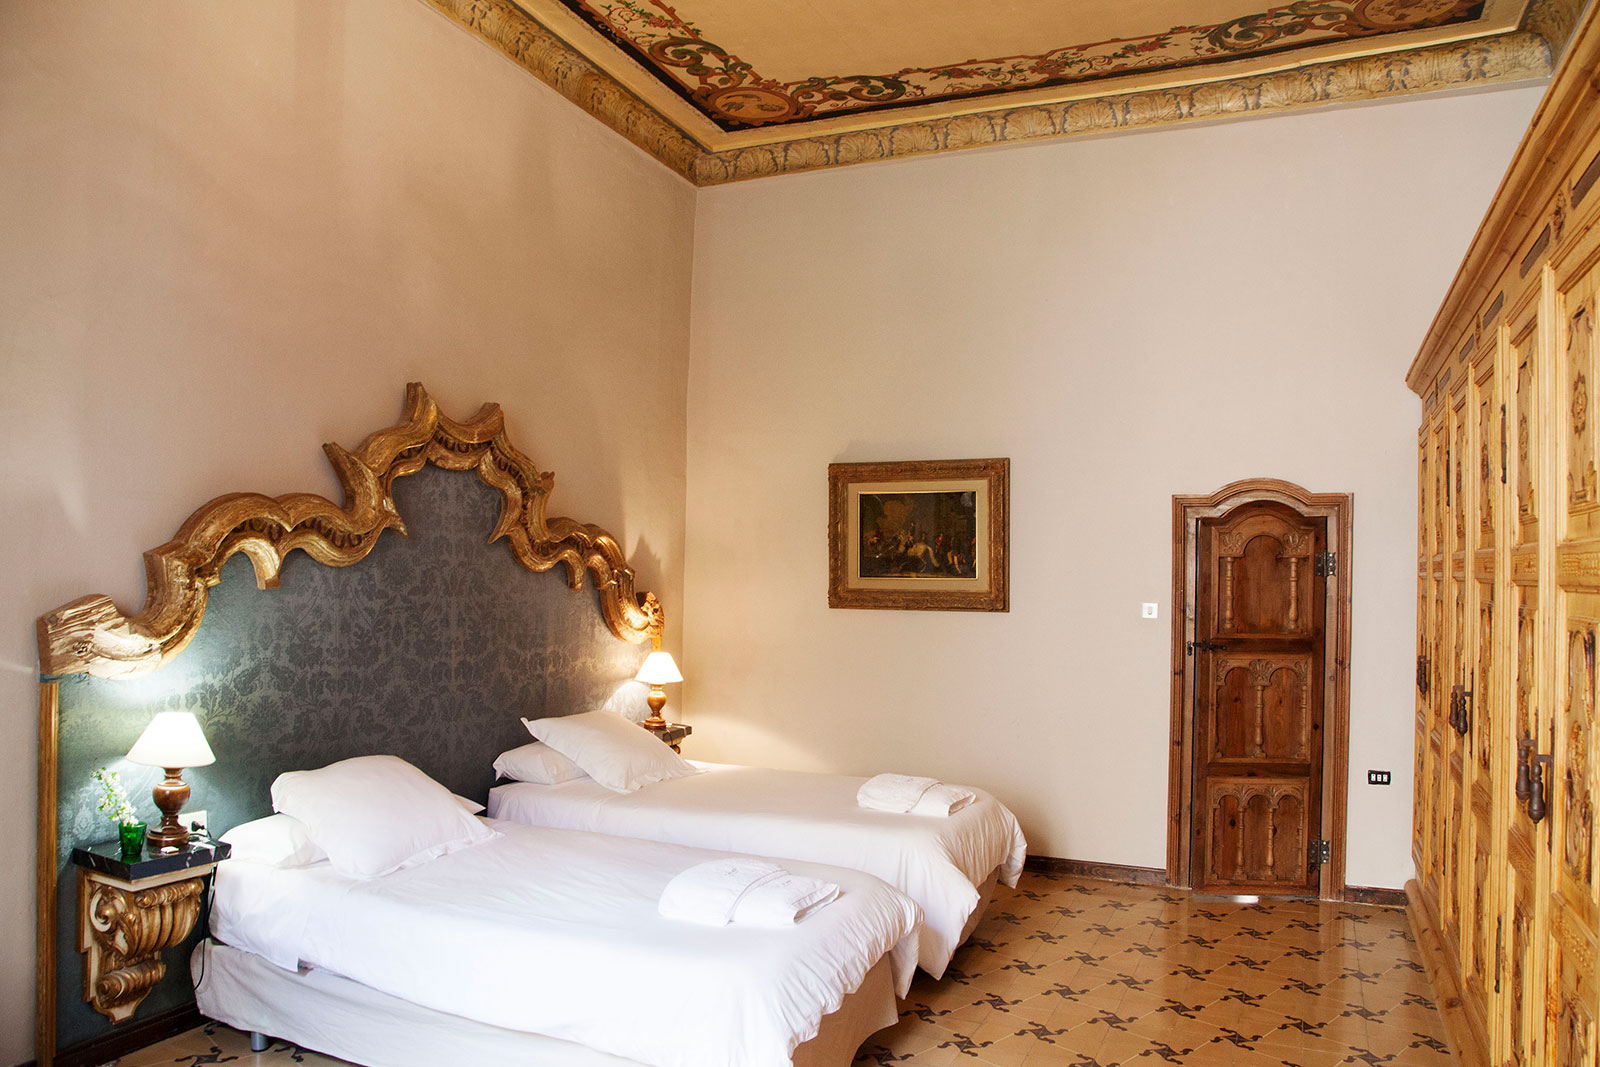 Siute Miracle hotel amb encant, Balaguer